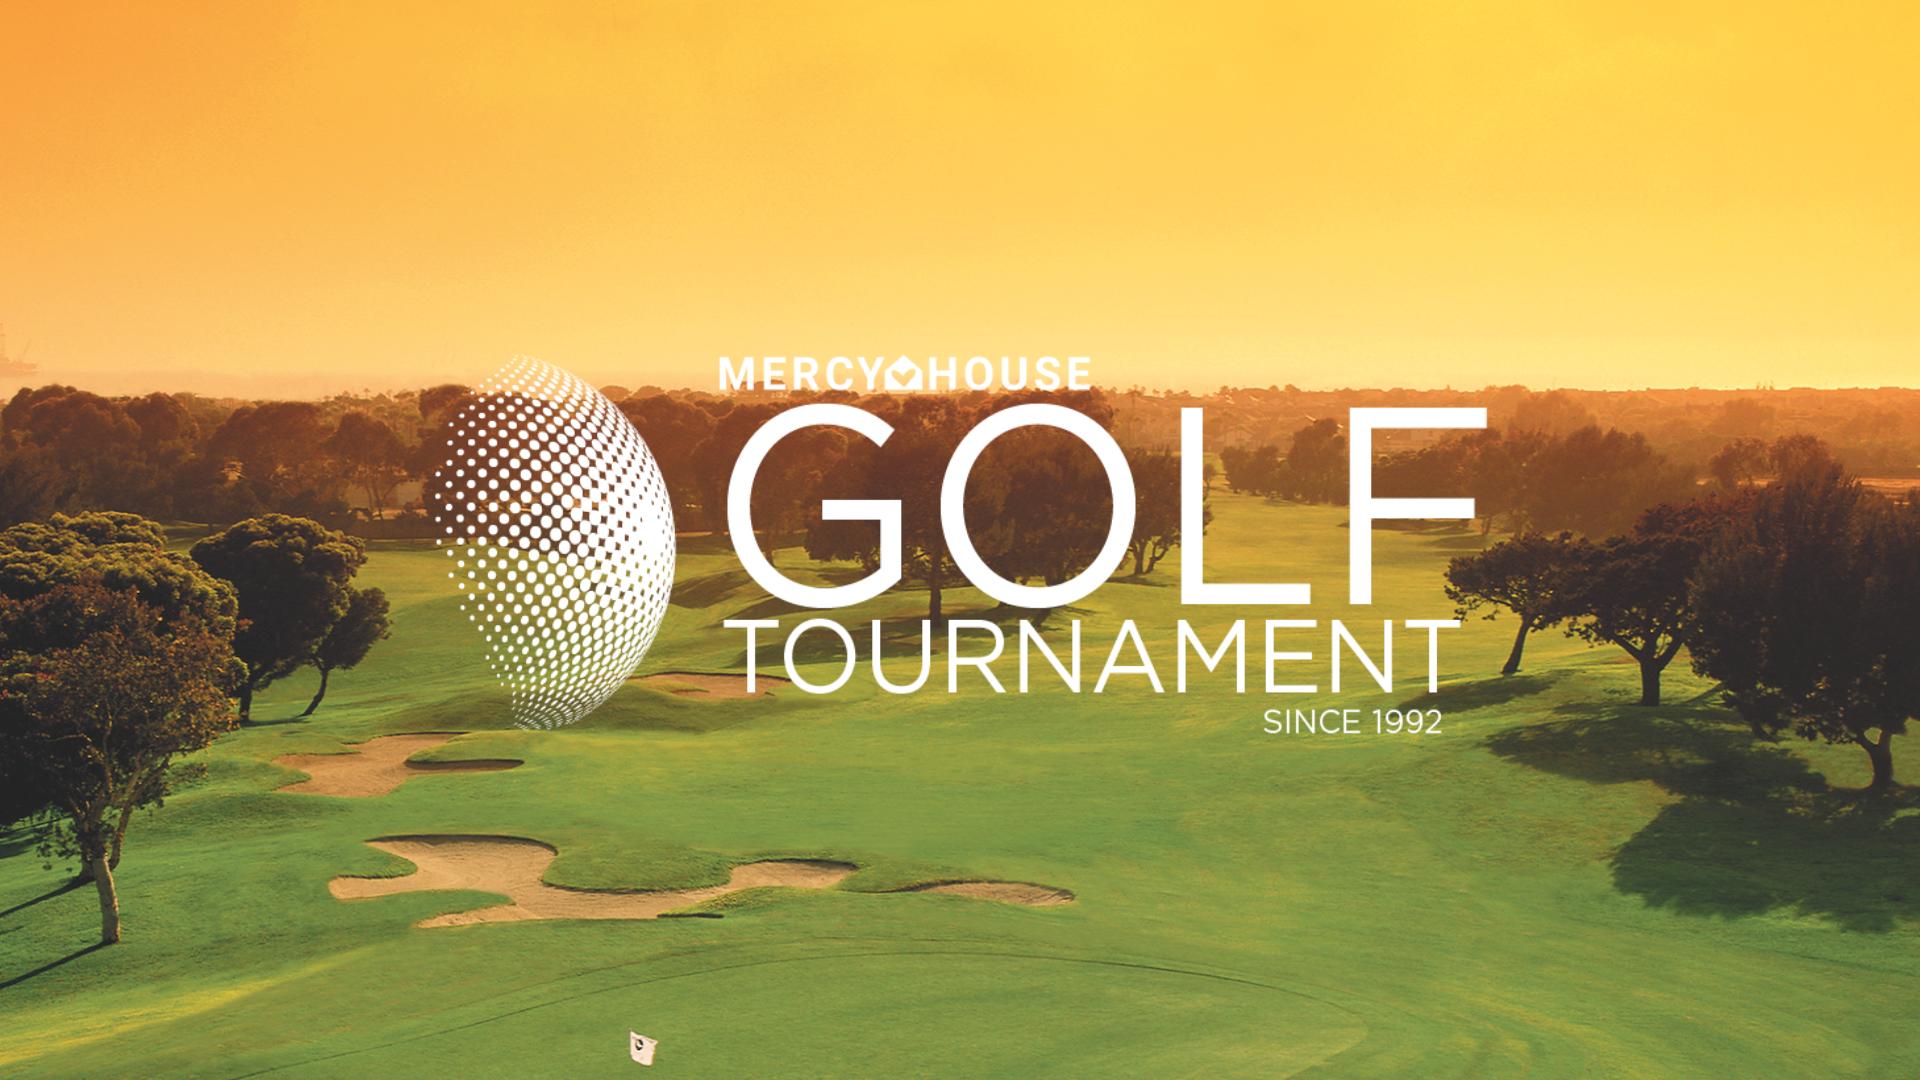 Golf logo over Golf Tournament photo